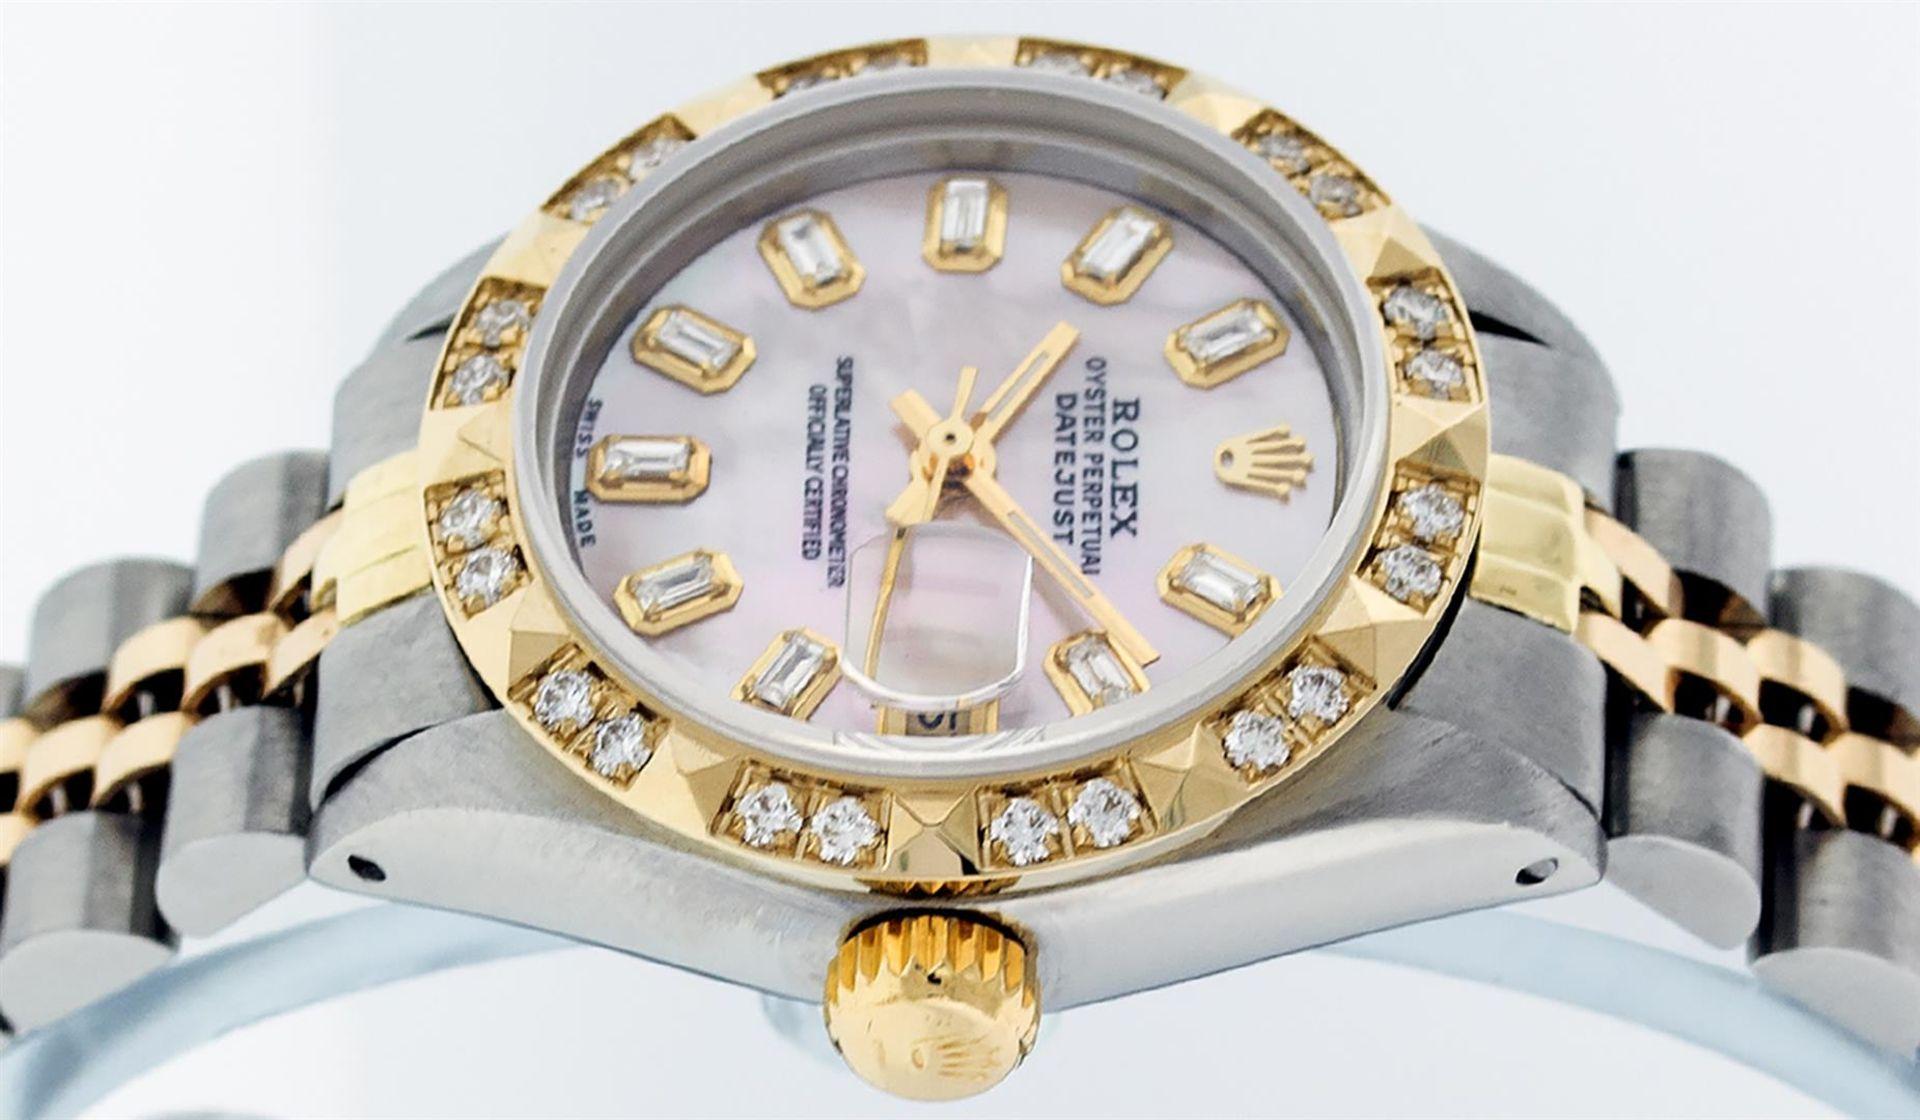 Rolex Ladies 26 2T Pink MOP Baguette 18K YG Diamond Bezel Serviced And Polished - Image 5 of 9